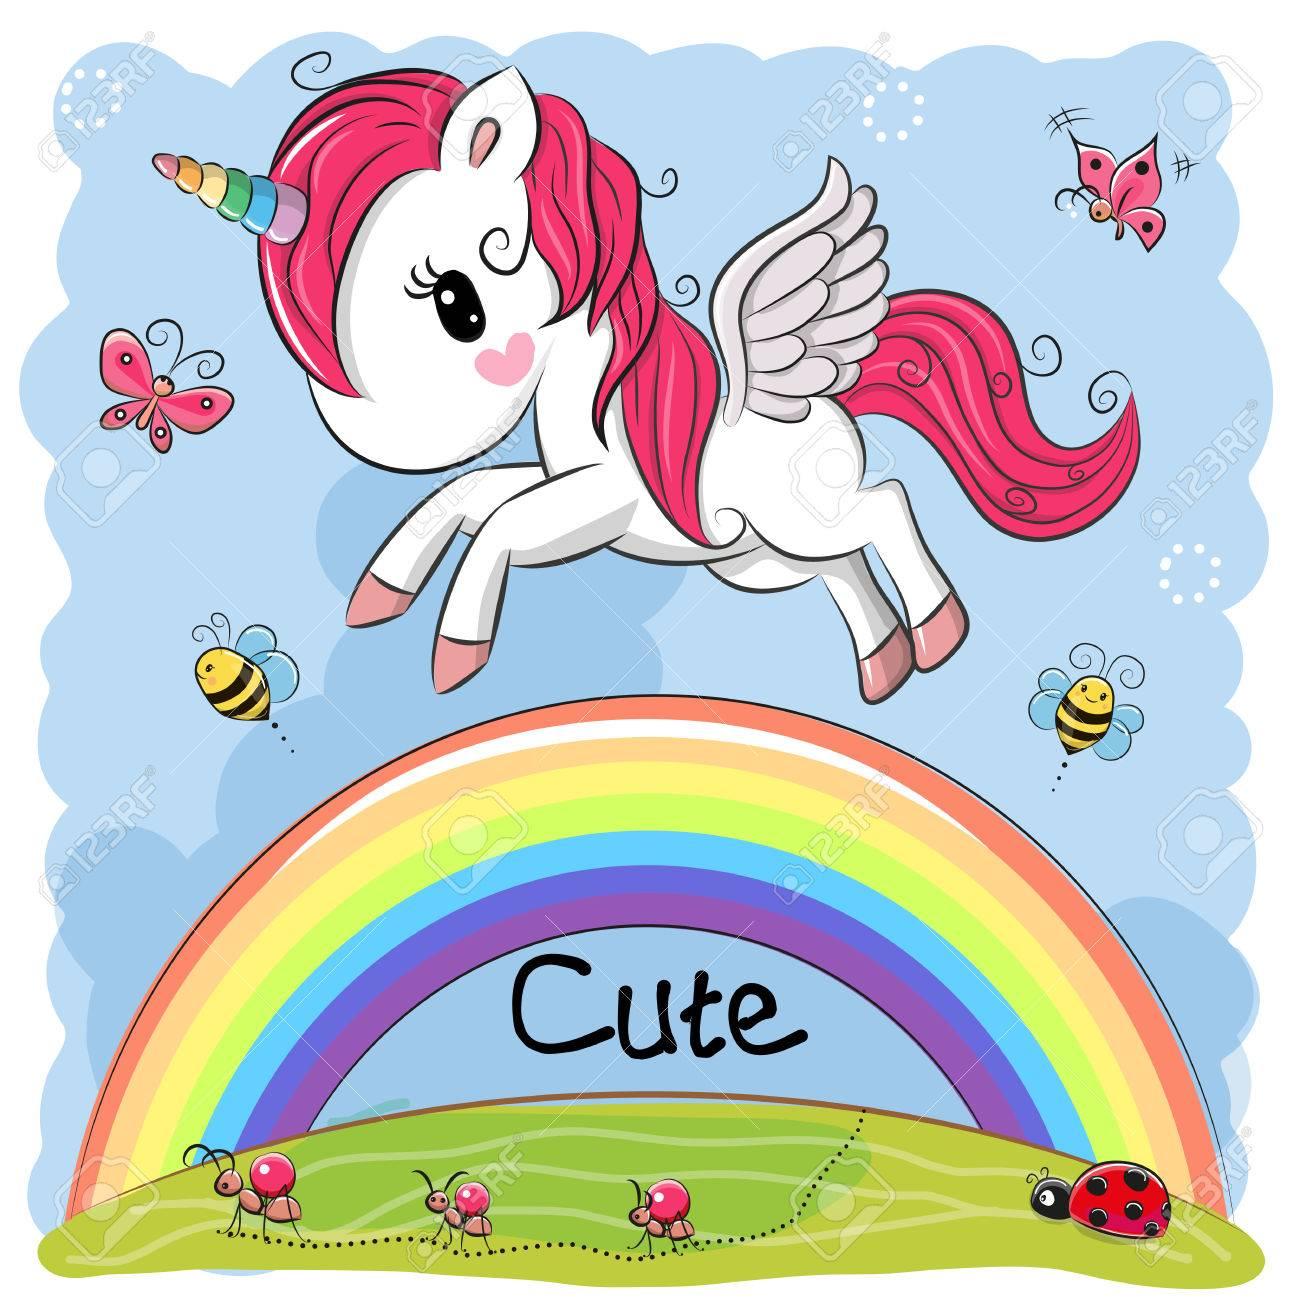 Cute Cartoon Unicorn is flying over the rainbow - 87041797